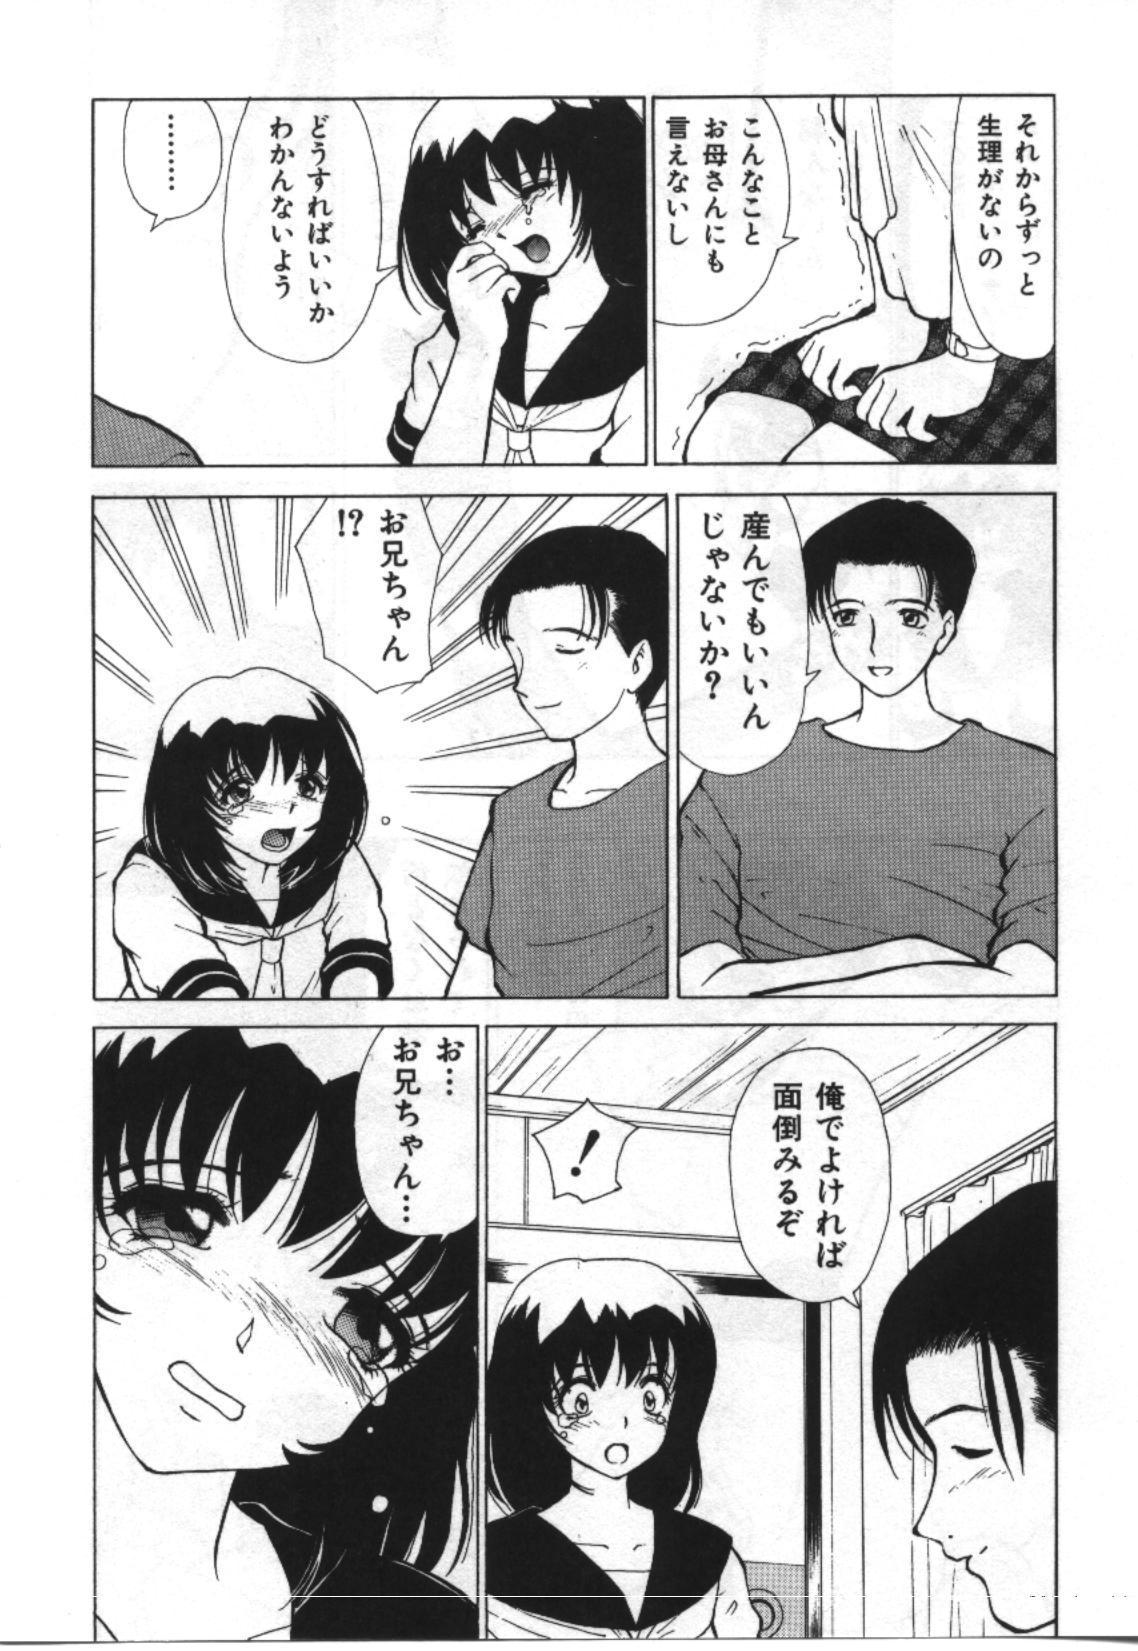 Imouto Koishi 2 107